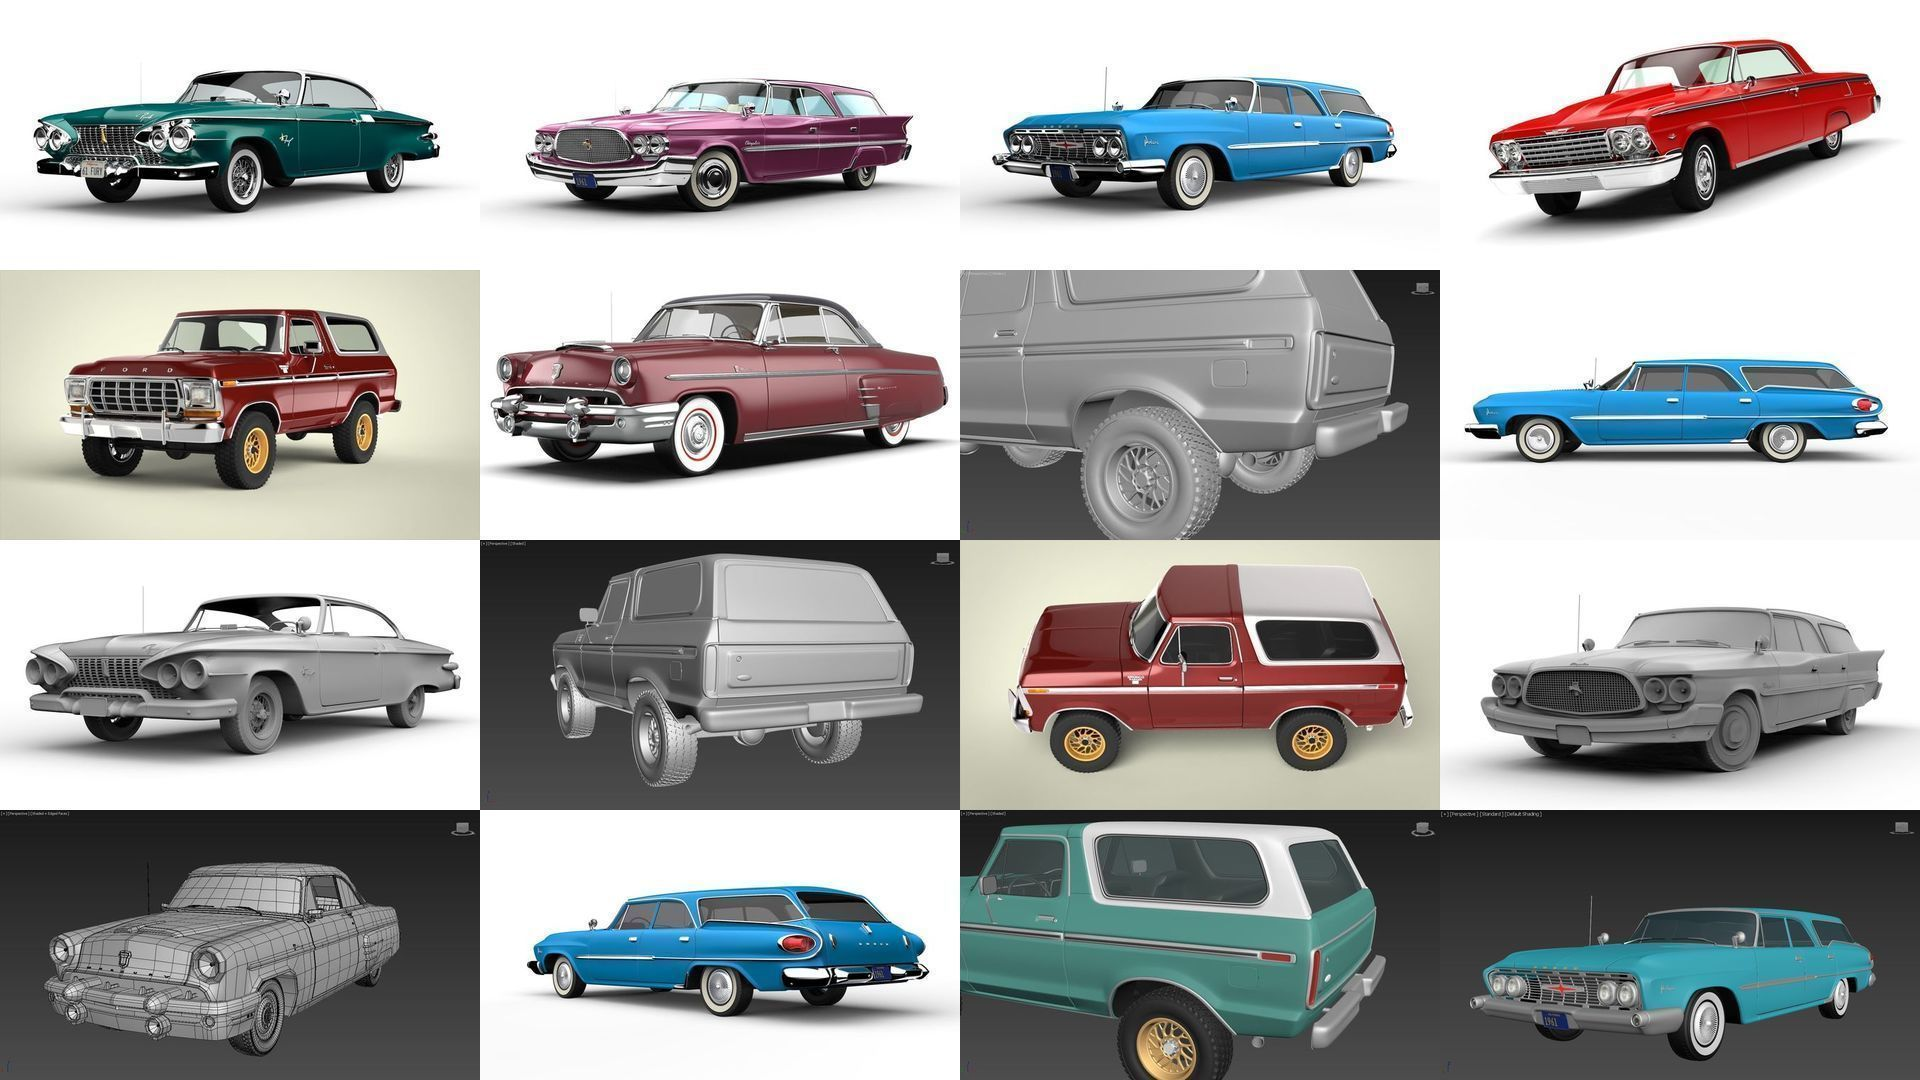 Old school American cars